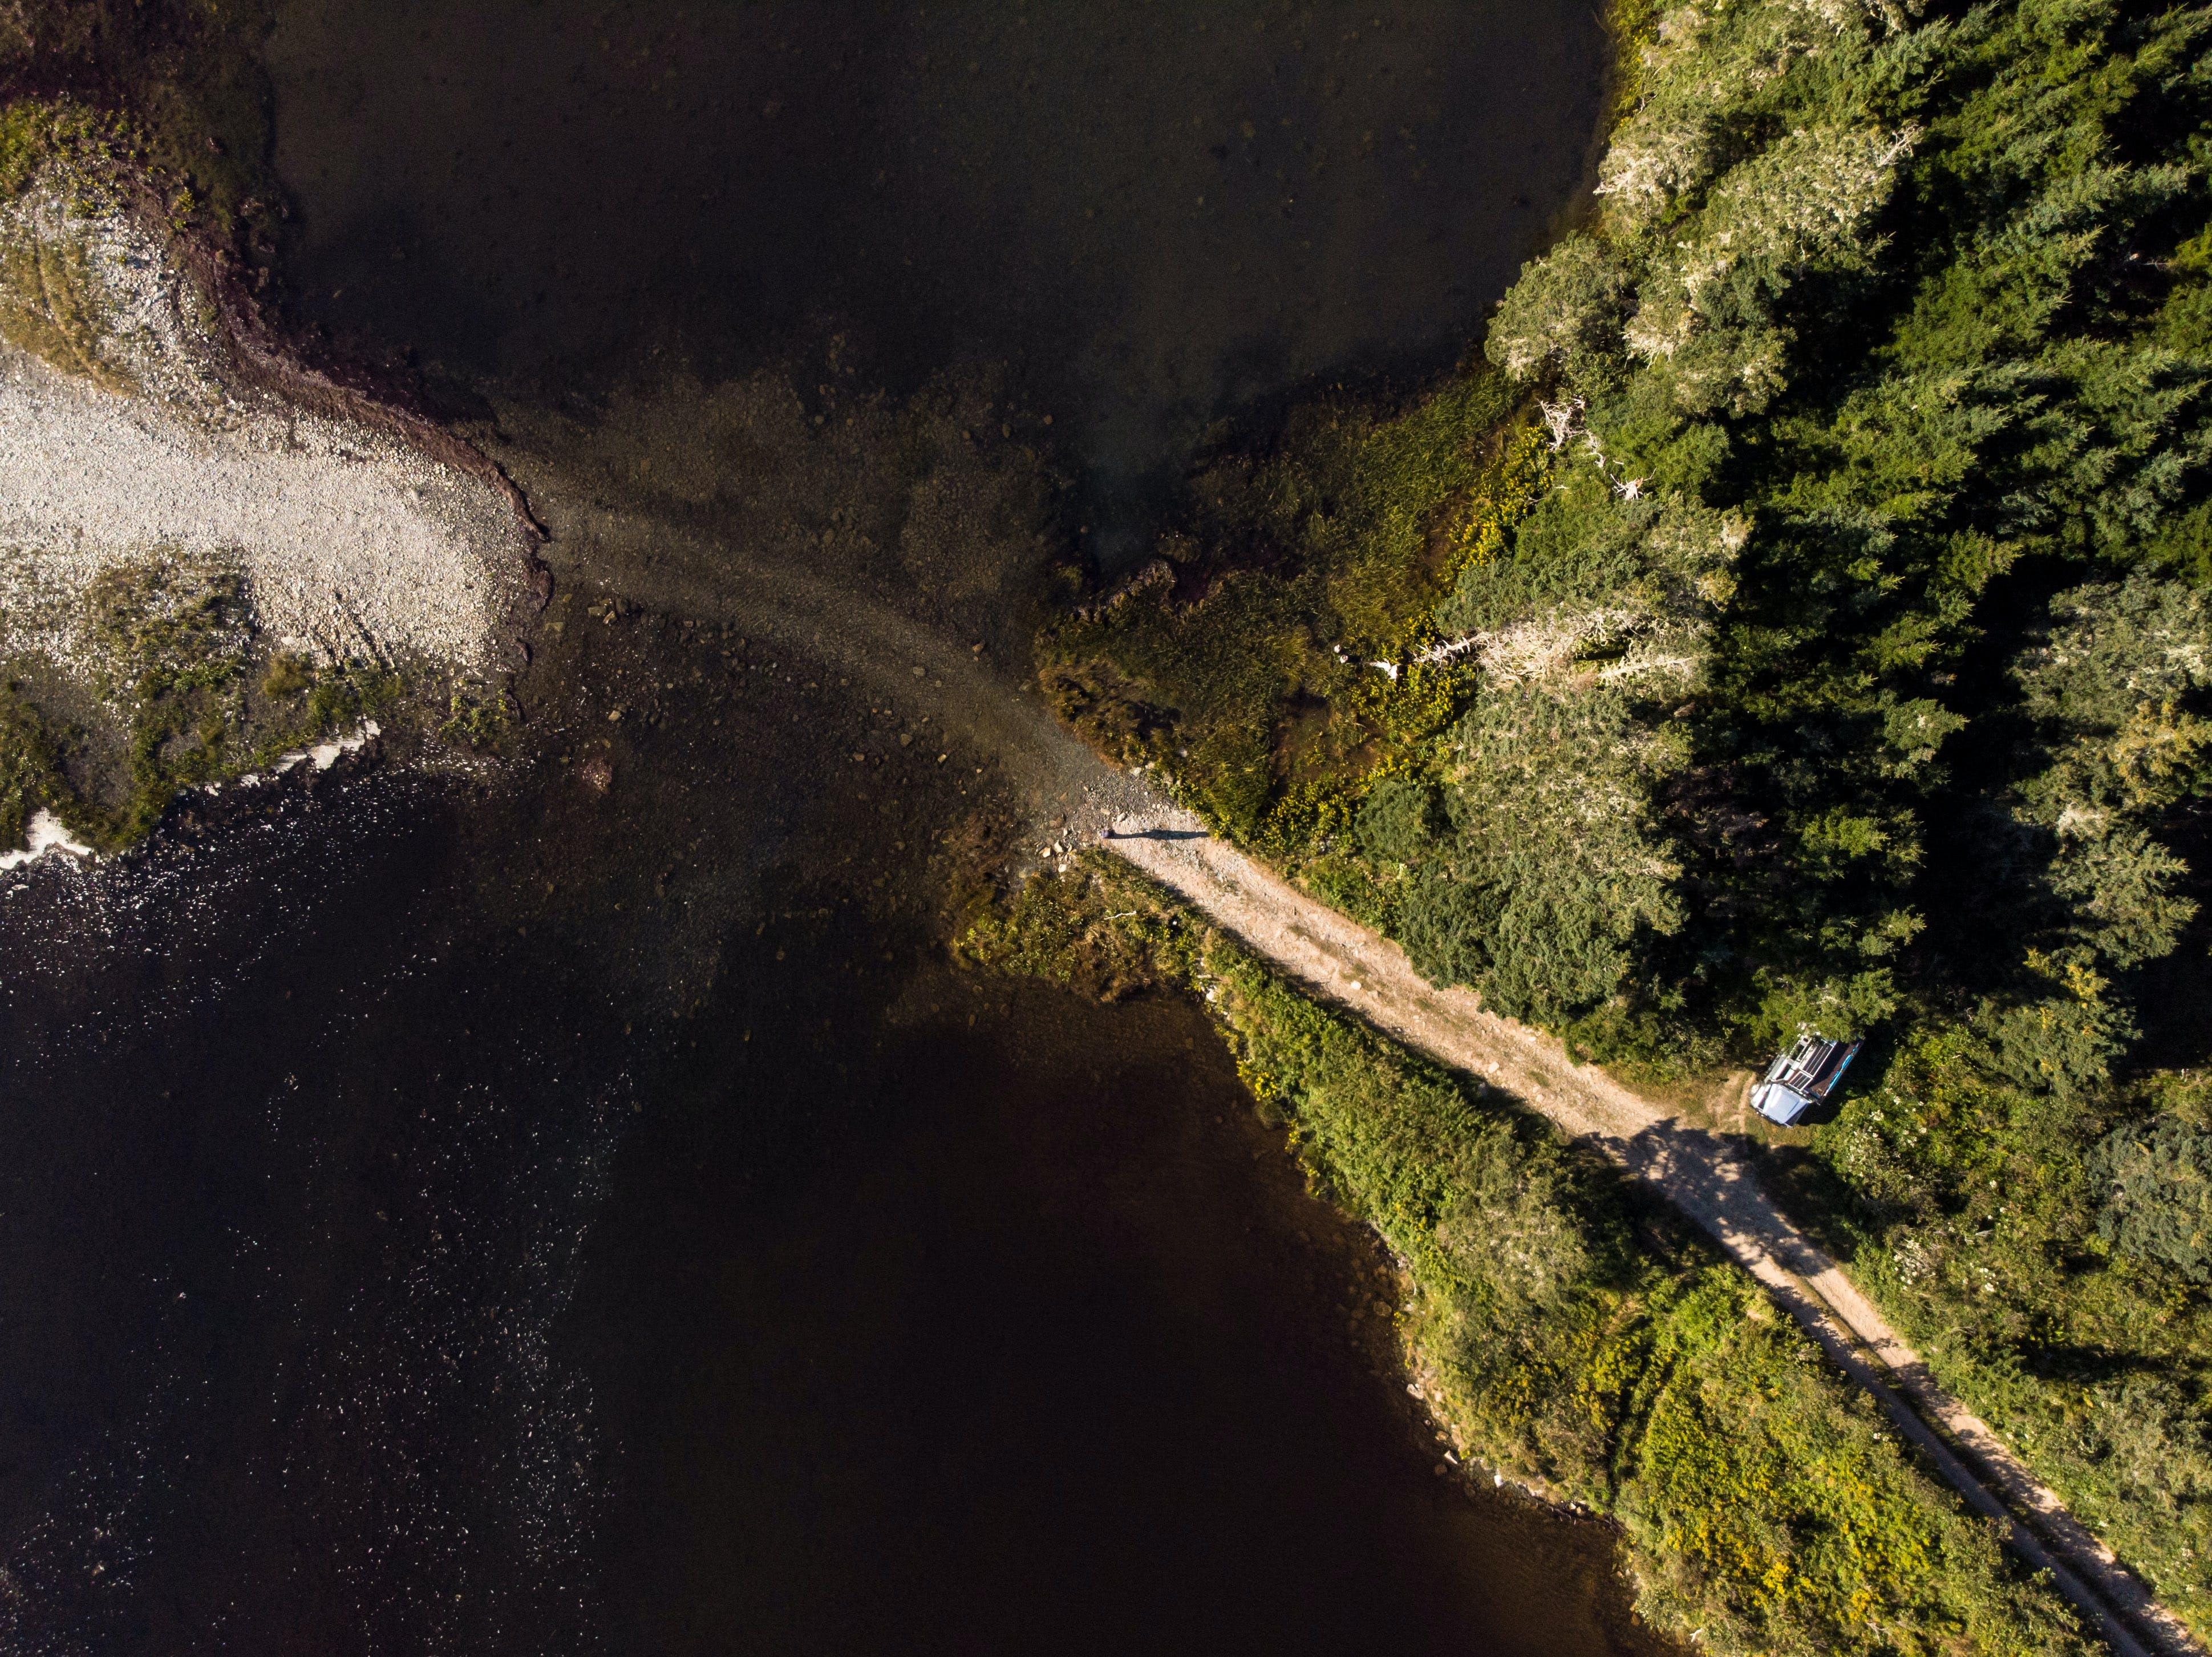 Kostenloses Stock Foto zu bäume, cape breton, kanada, luftschuß